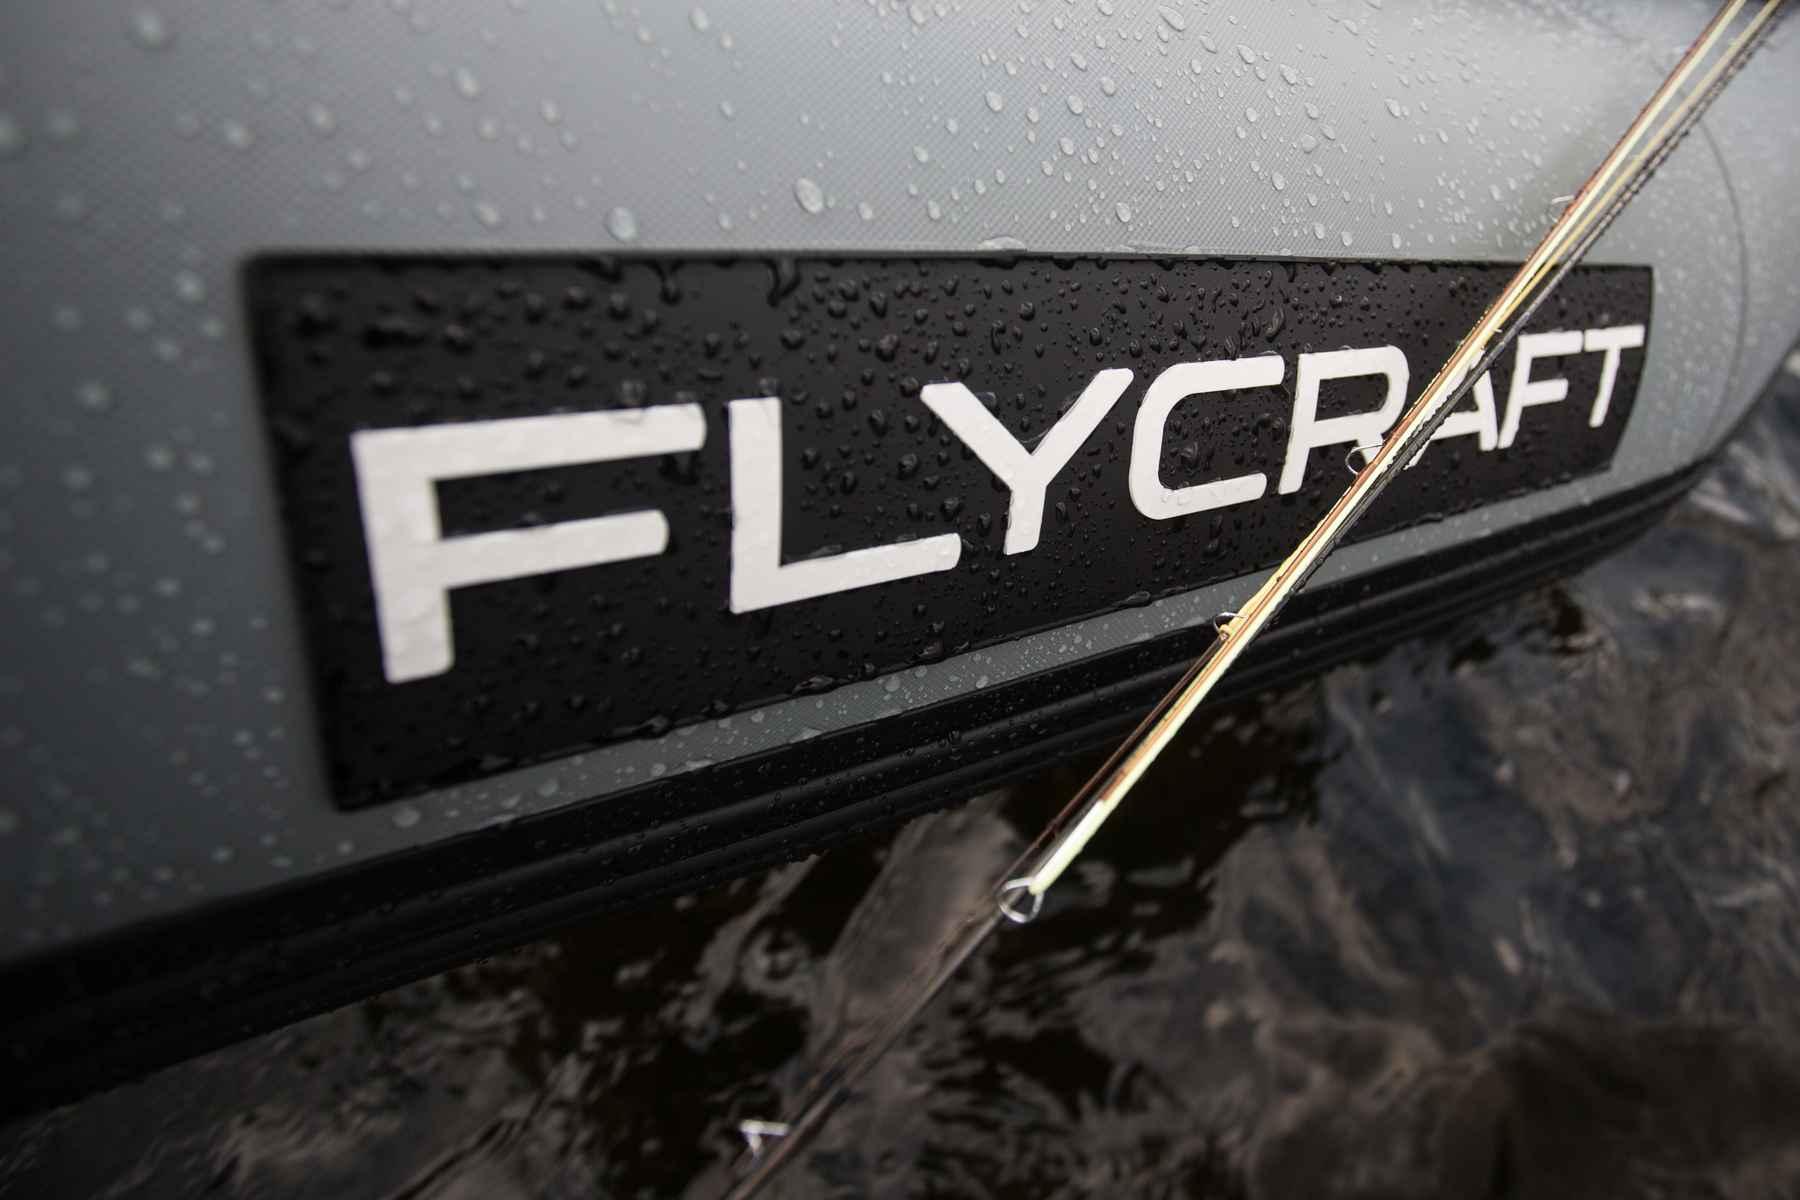 Review: Flycraft Stealth fishing craft | Hatch Magazine